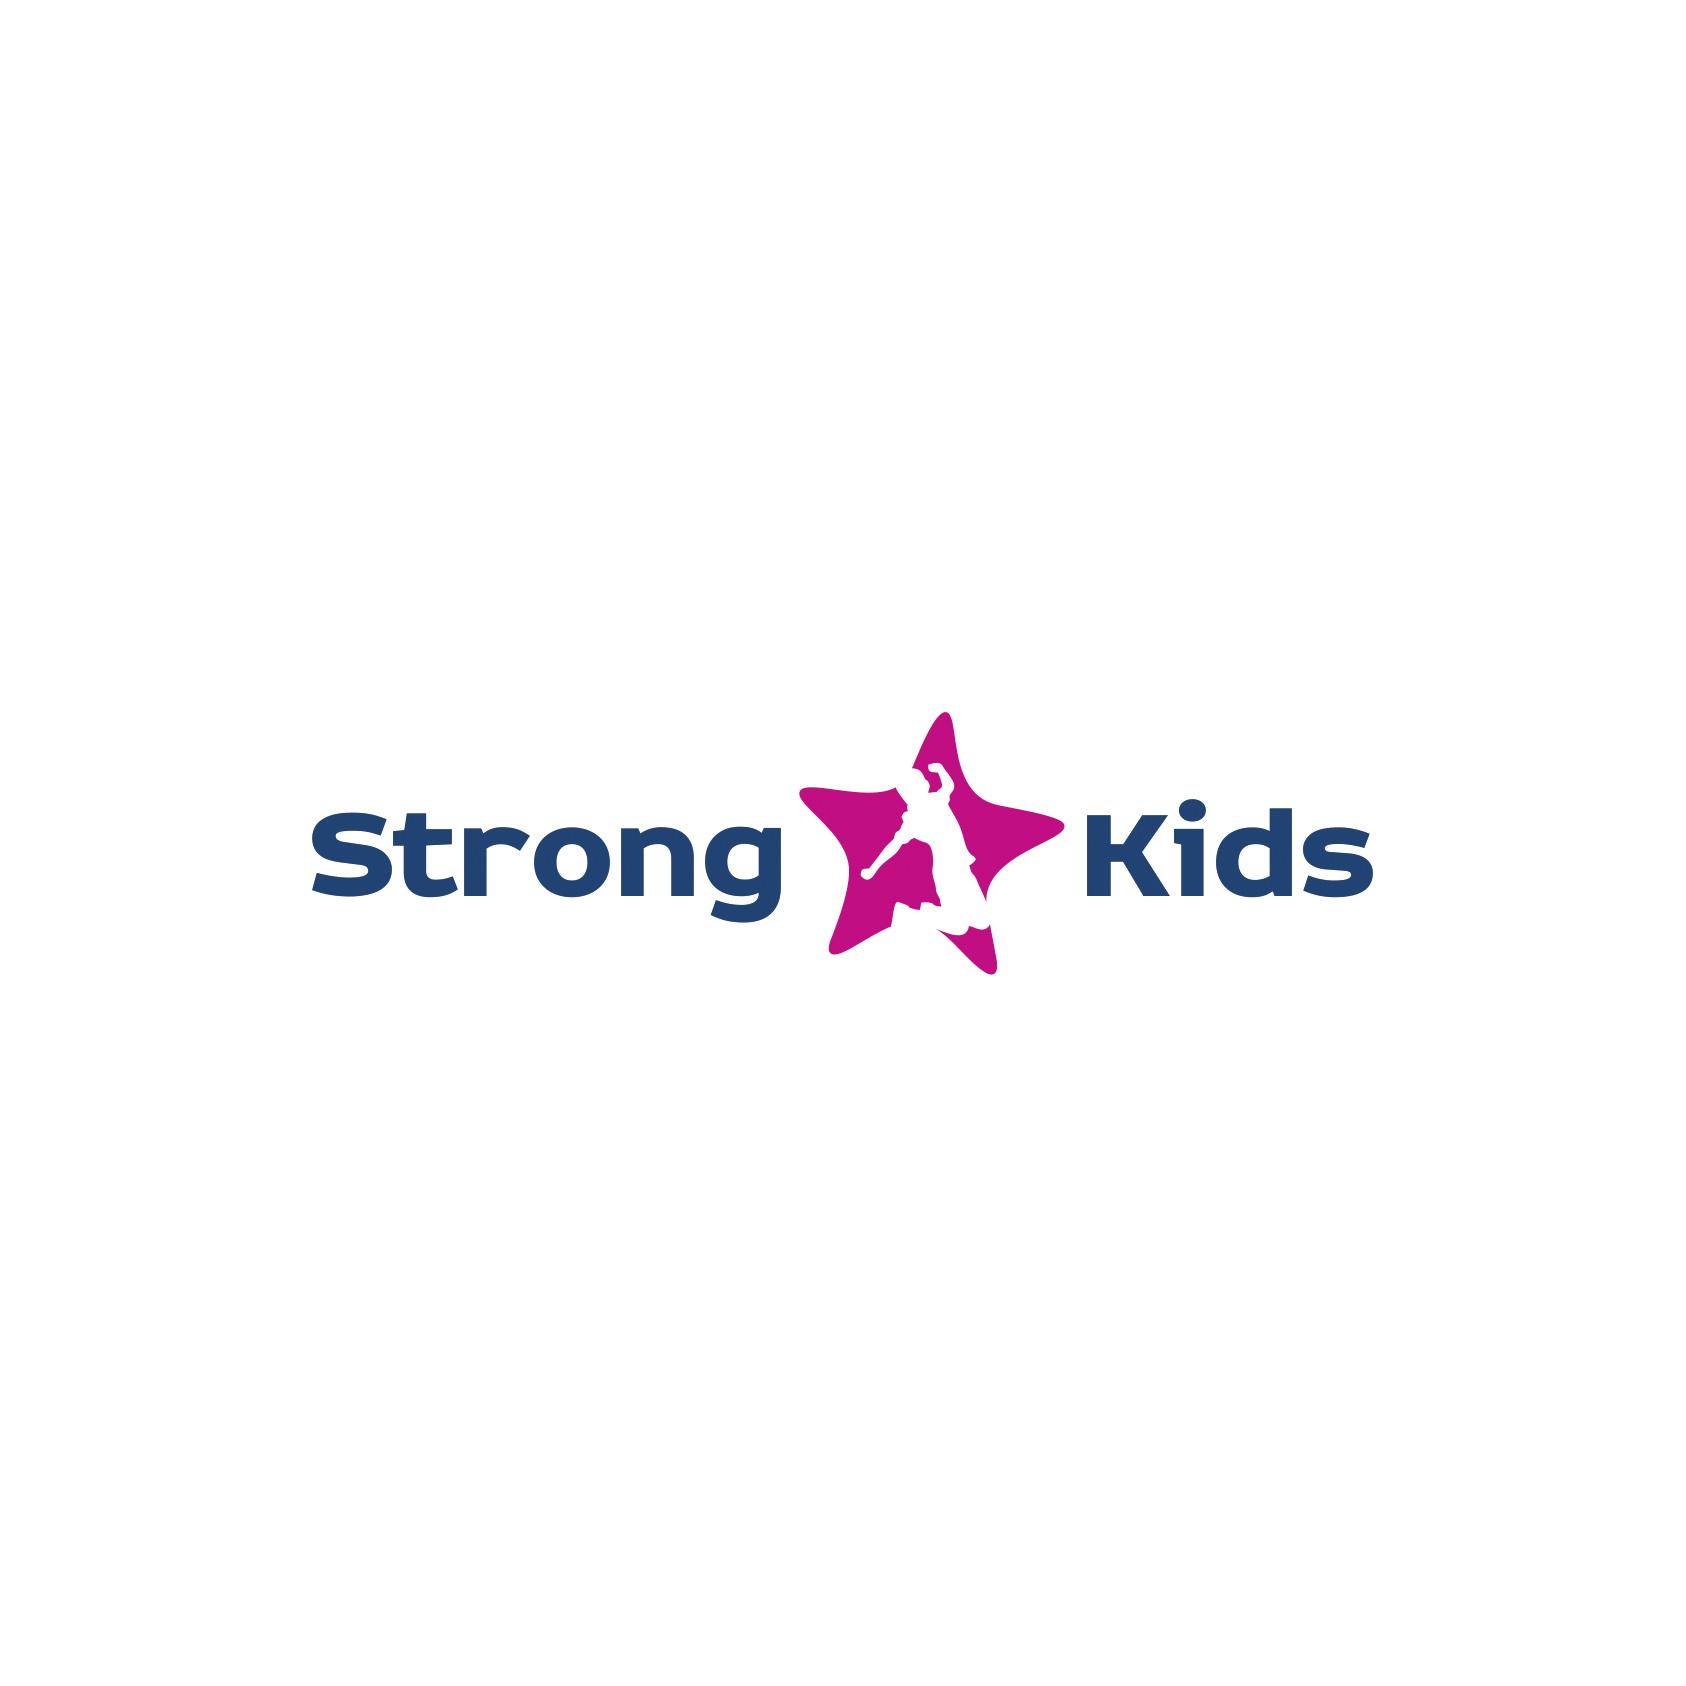 Логотип для Детского Интернет Магазина StrongKids фото f_9685c653f3994011.jpg